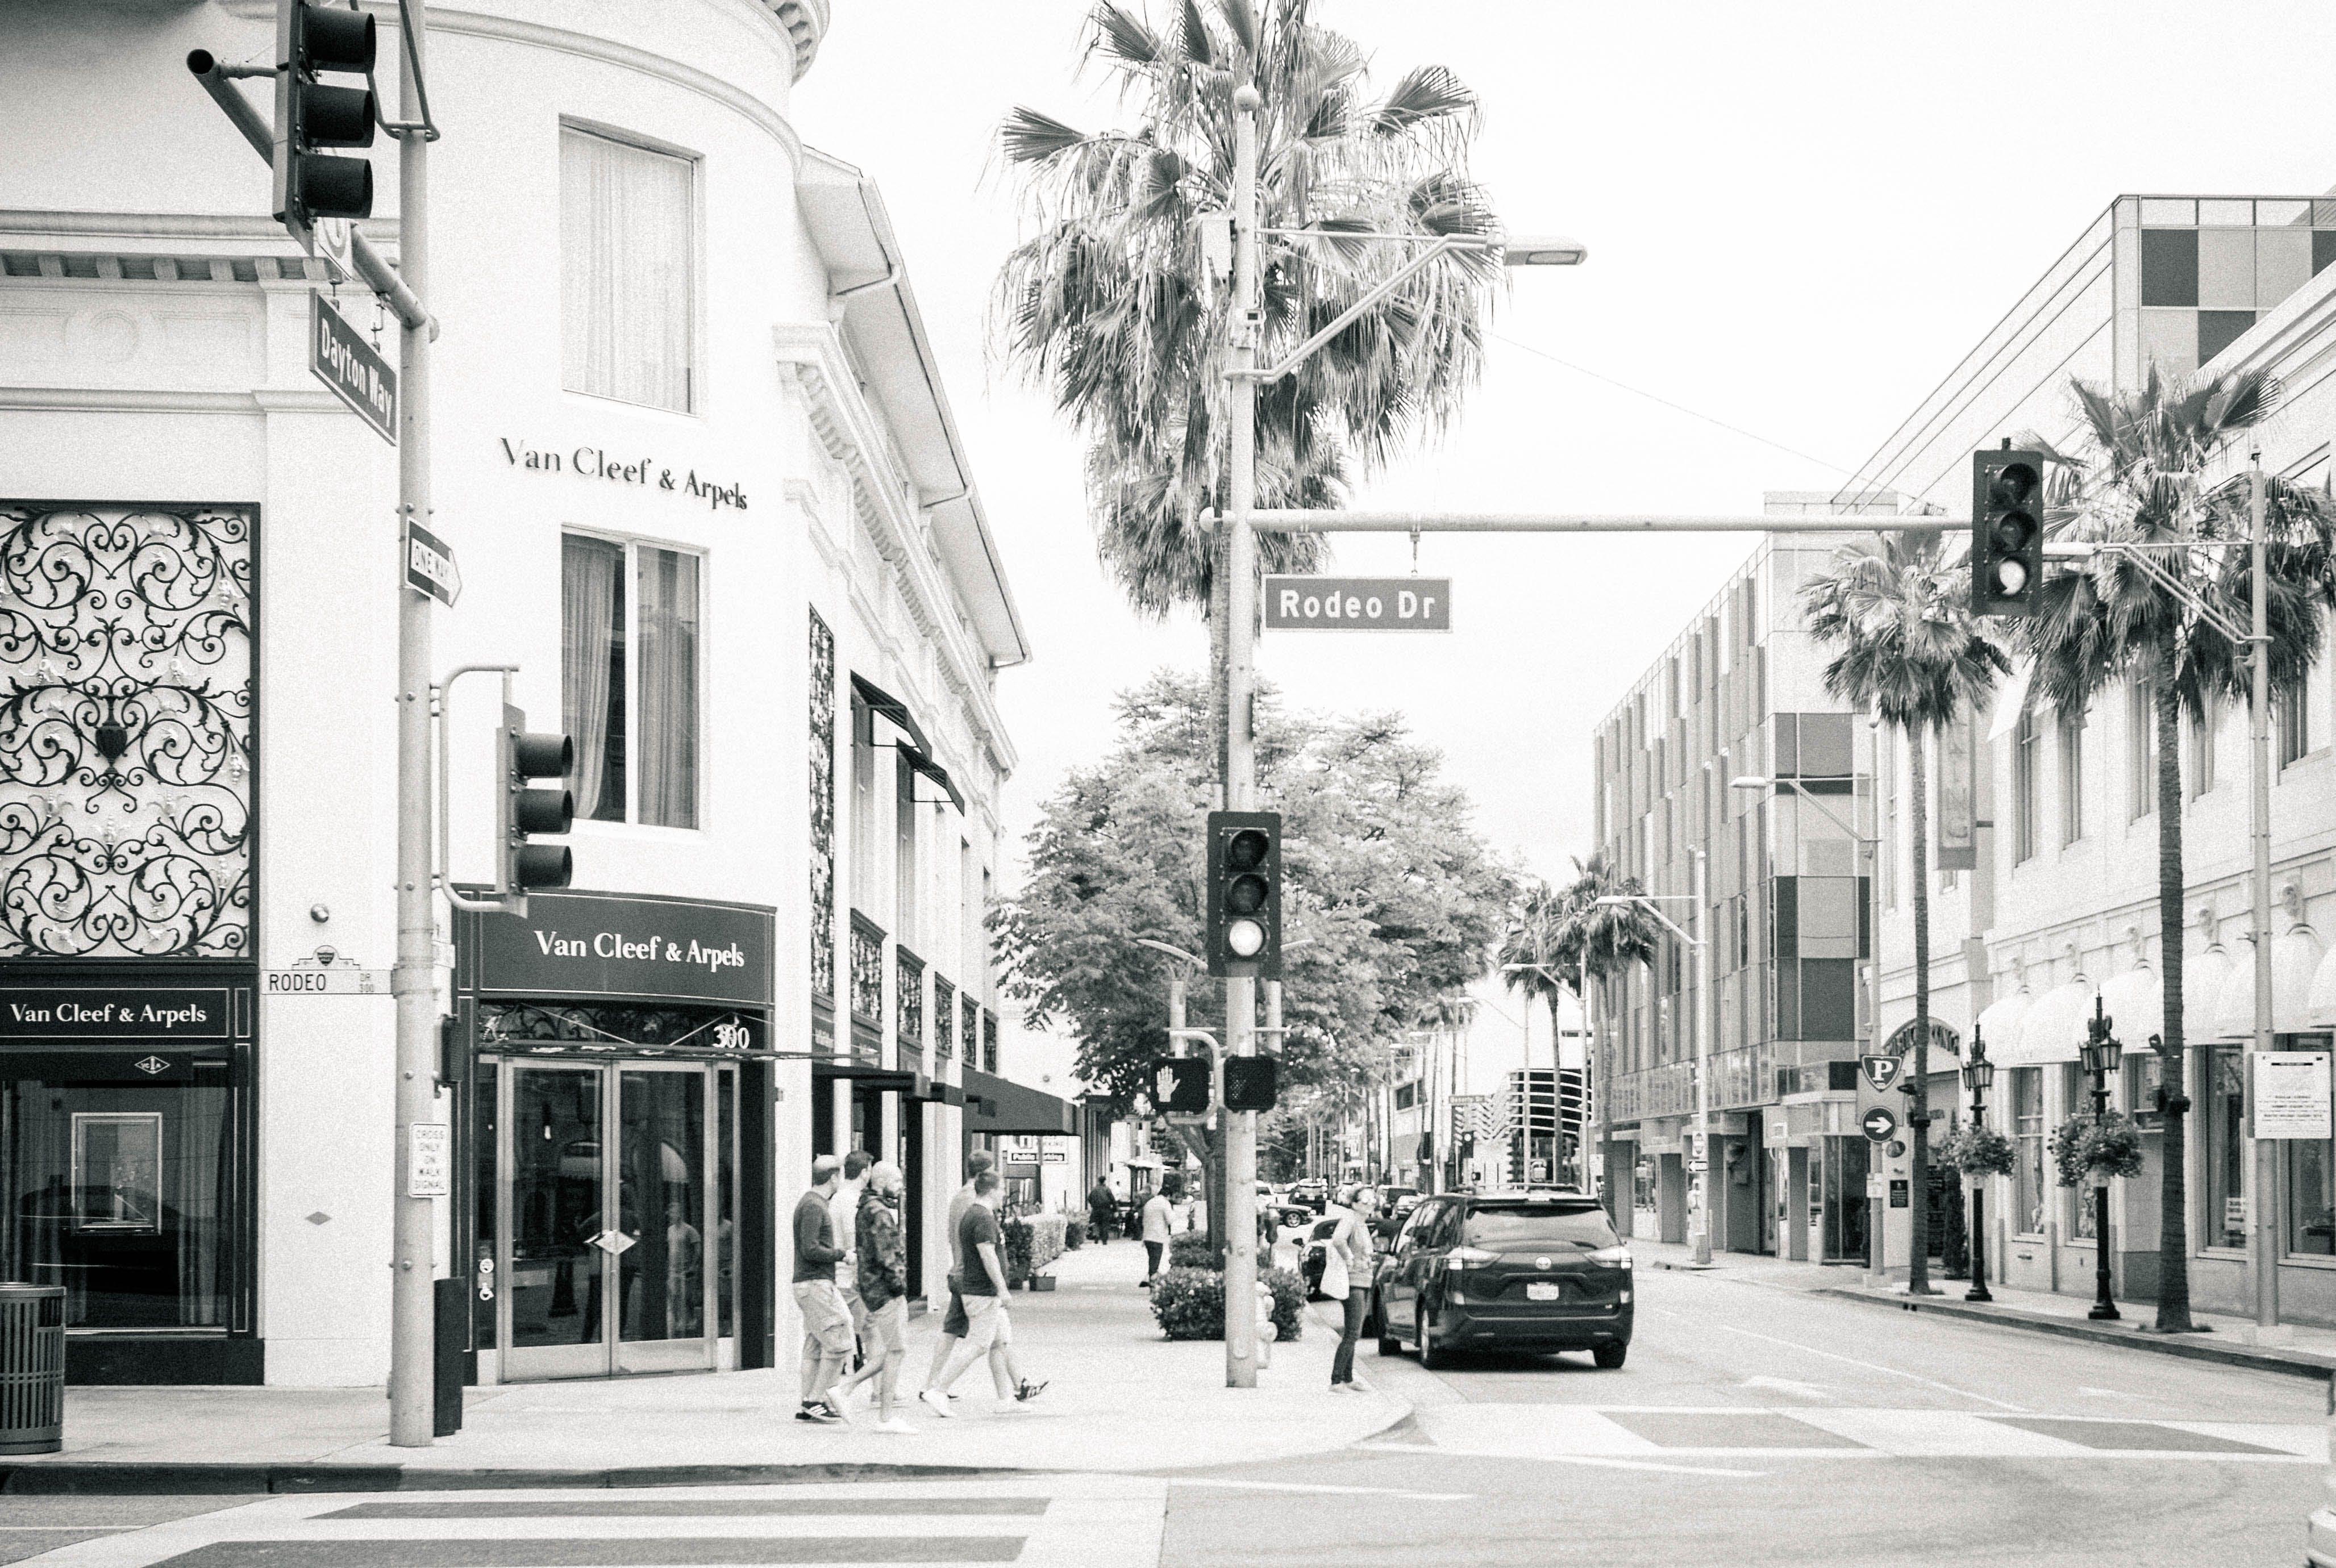 black and white, palm trees, street corner